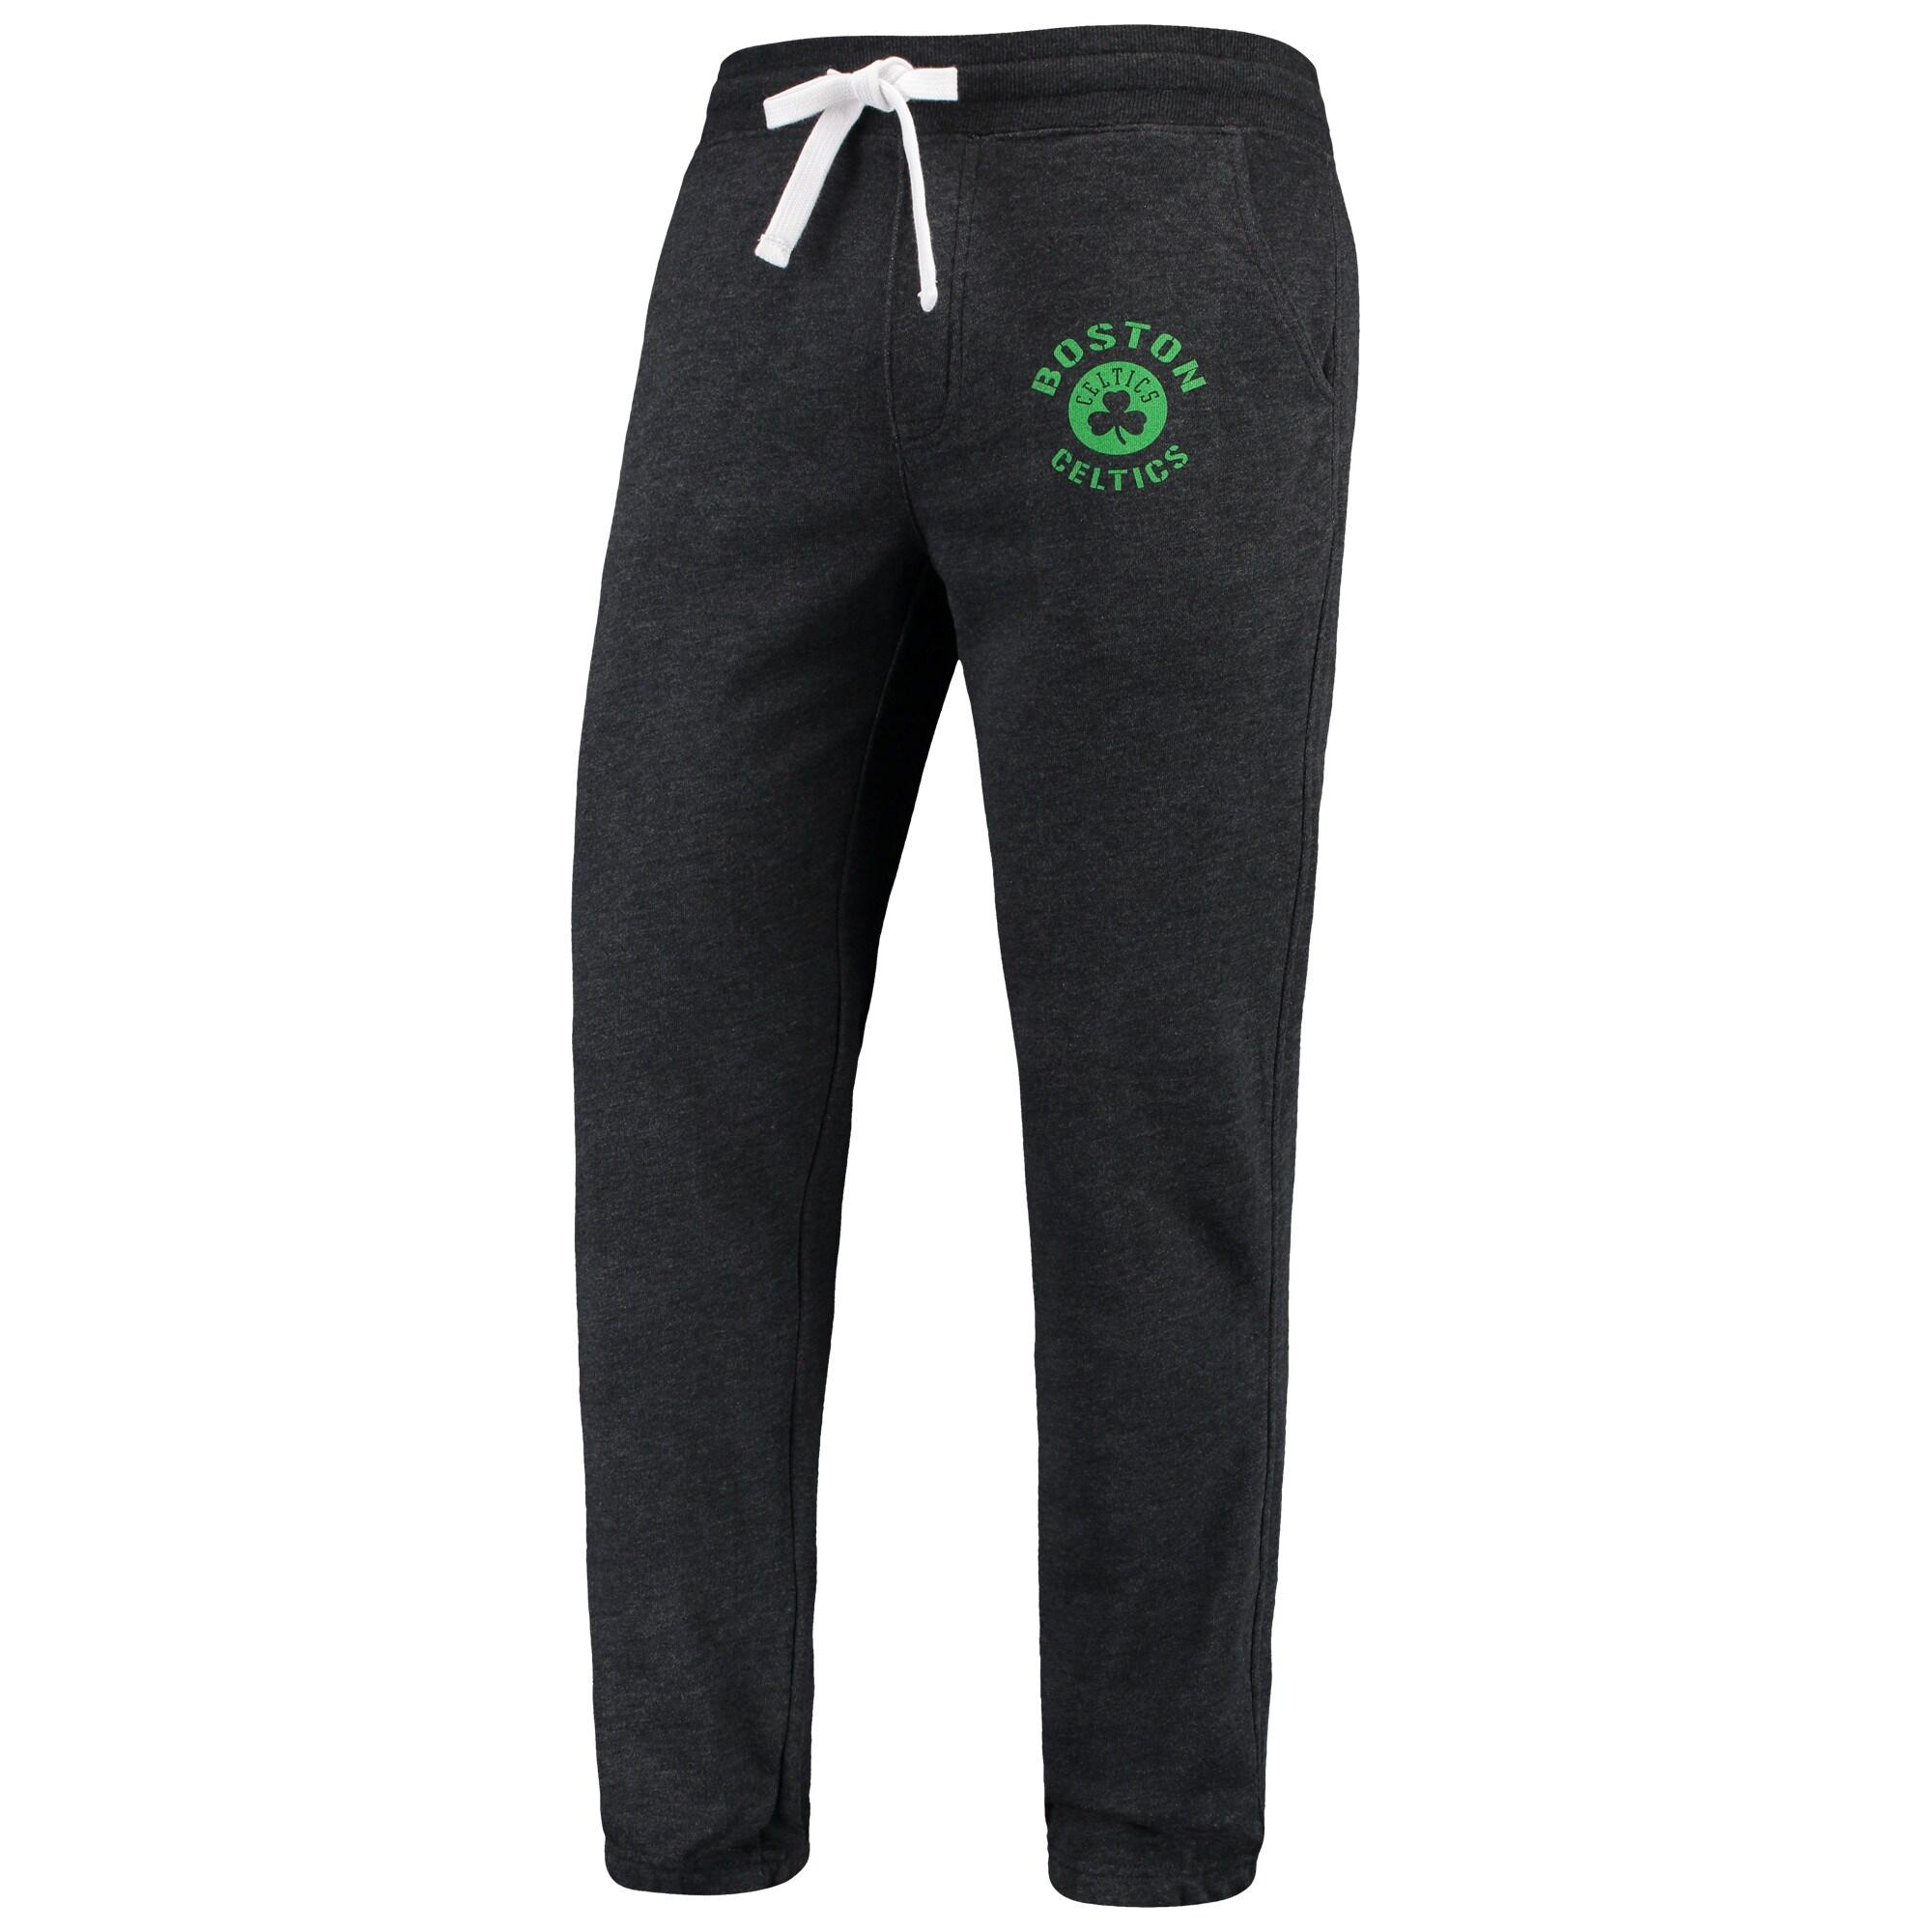 Boston Celtics Sportiqe Quincy French Terry Classic Sweatpants - Black